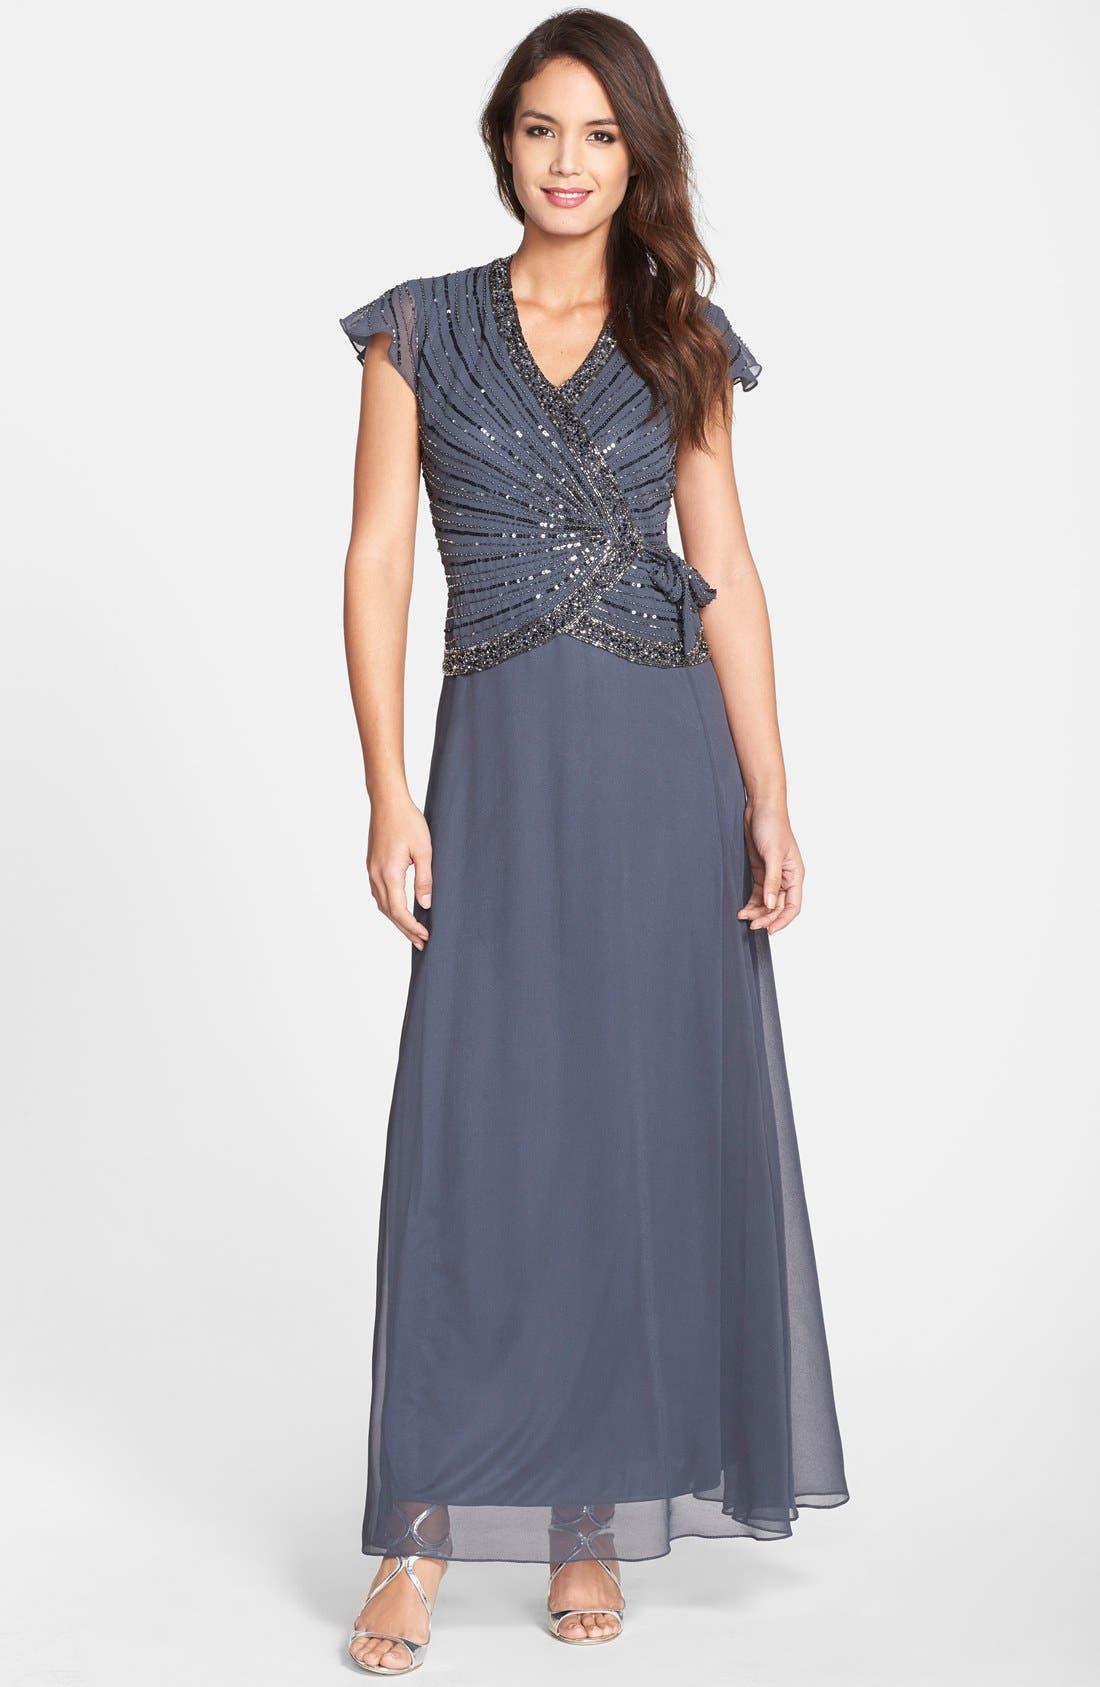 Main Image - J Kara Embellished Mock Two-Piece Gown